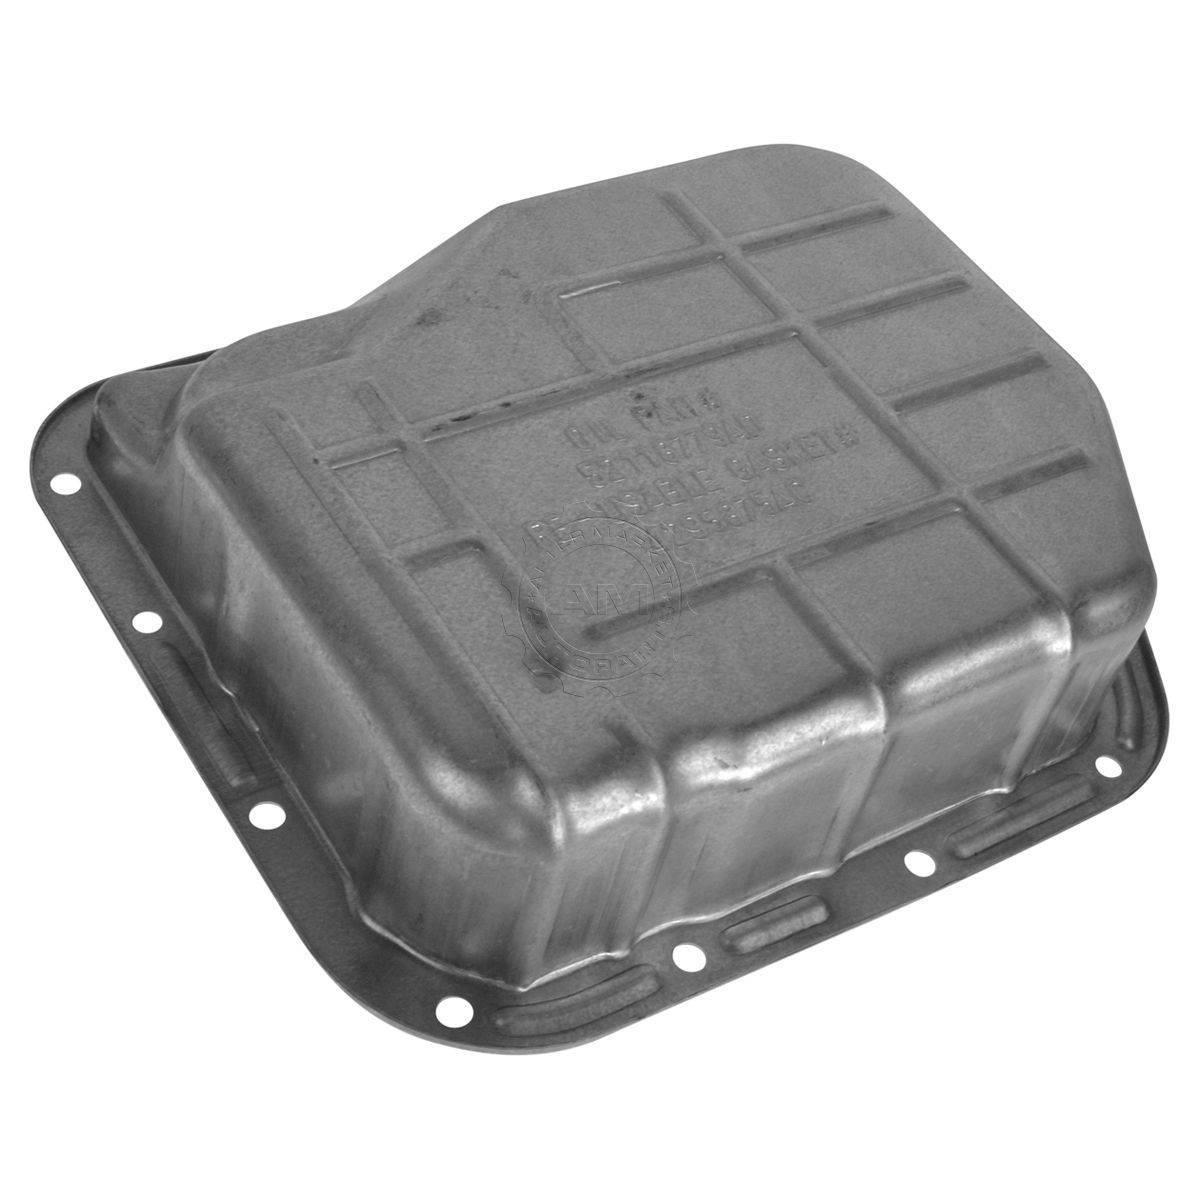 GASKET CORK 904 SMALL PAN